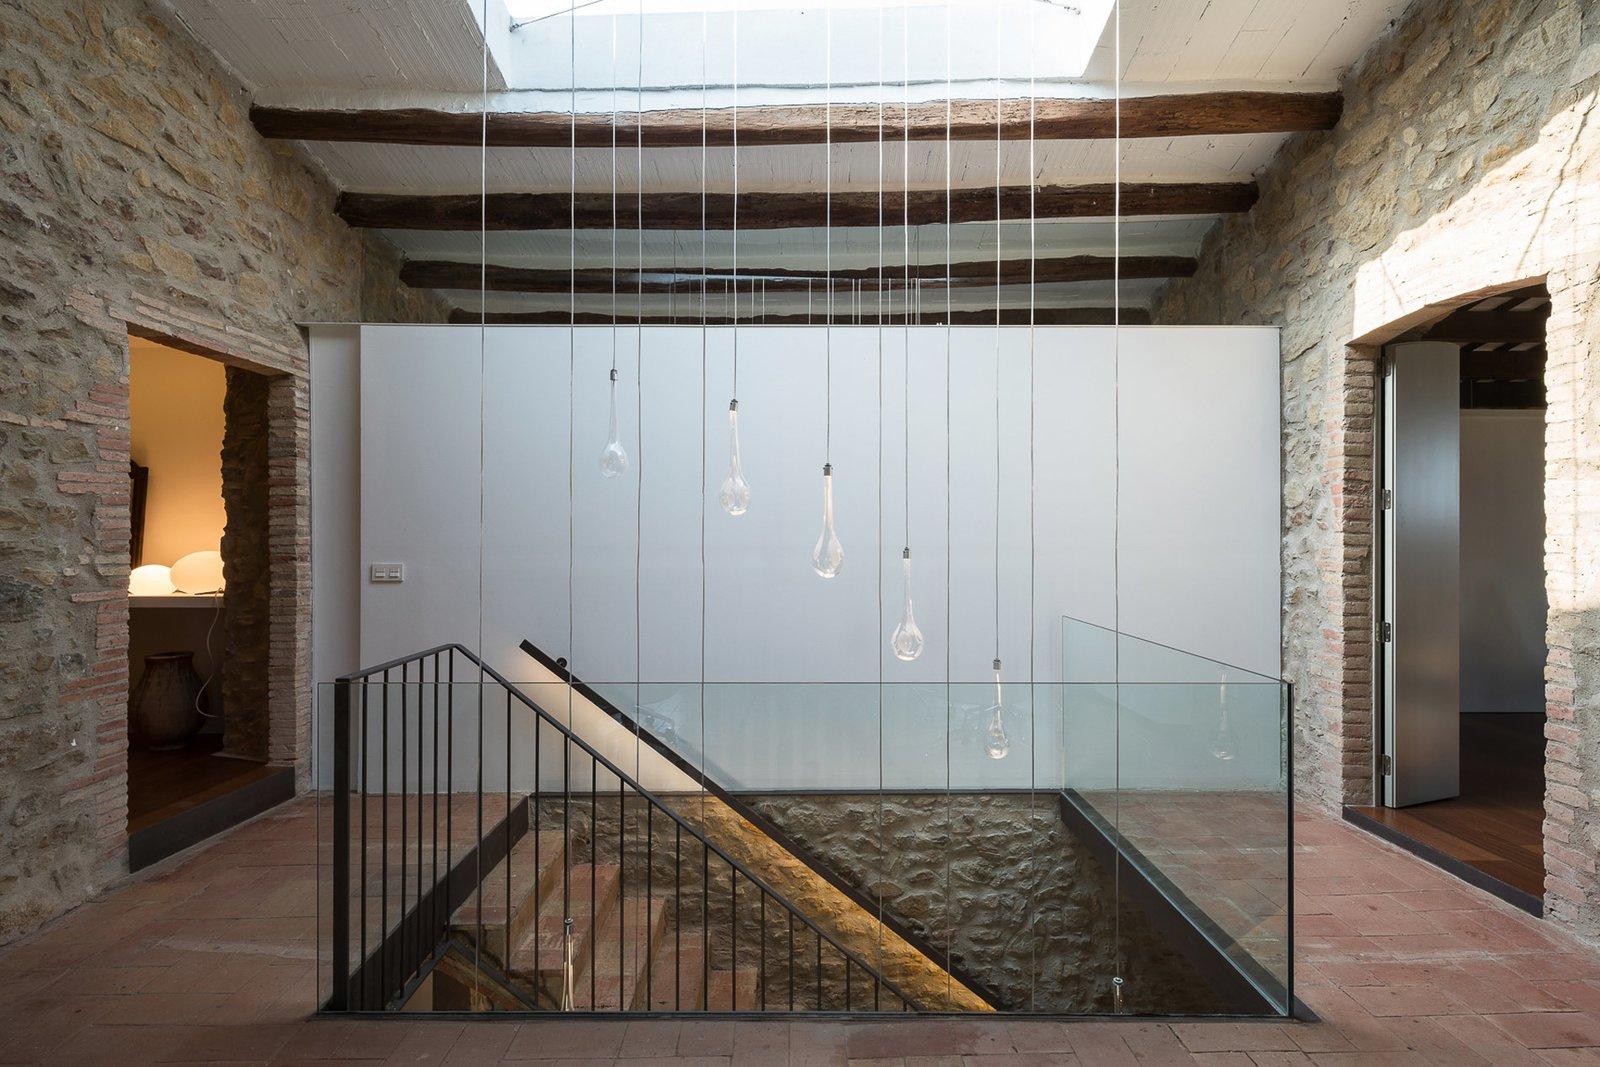 Photo 10 of 14 in Farmhouse In Girona, Spain